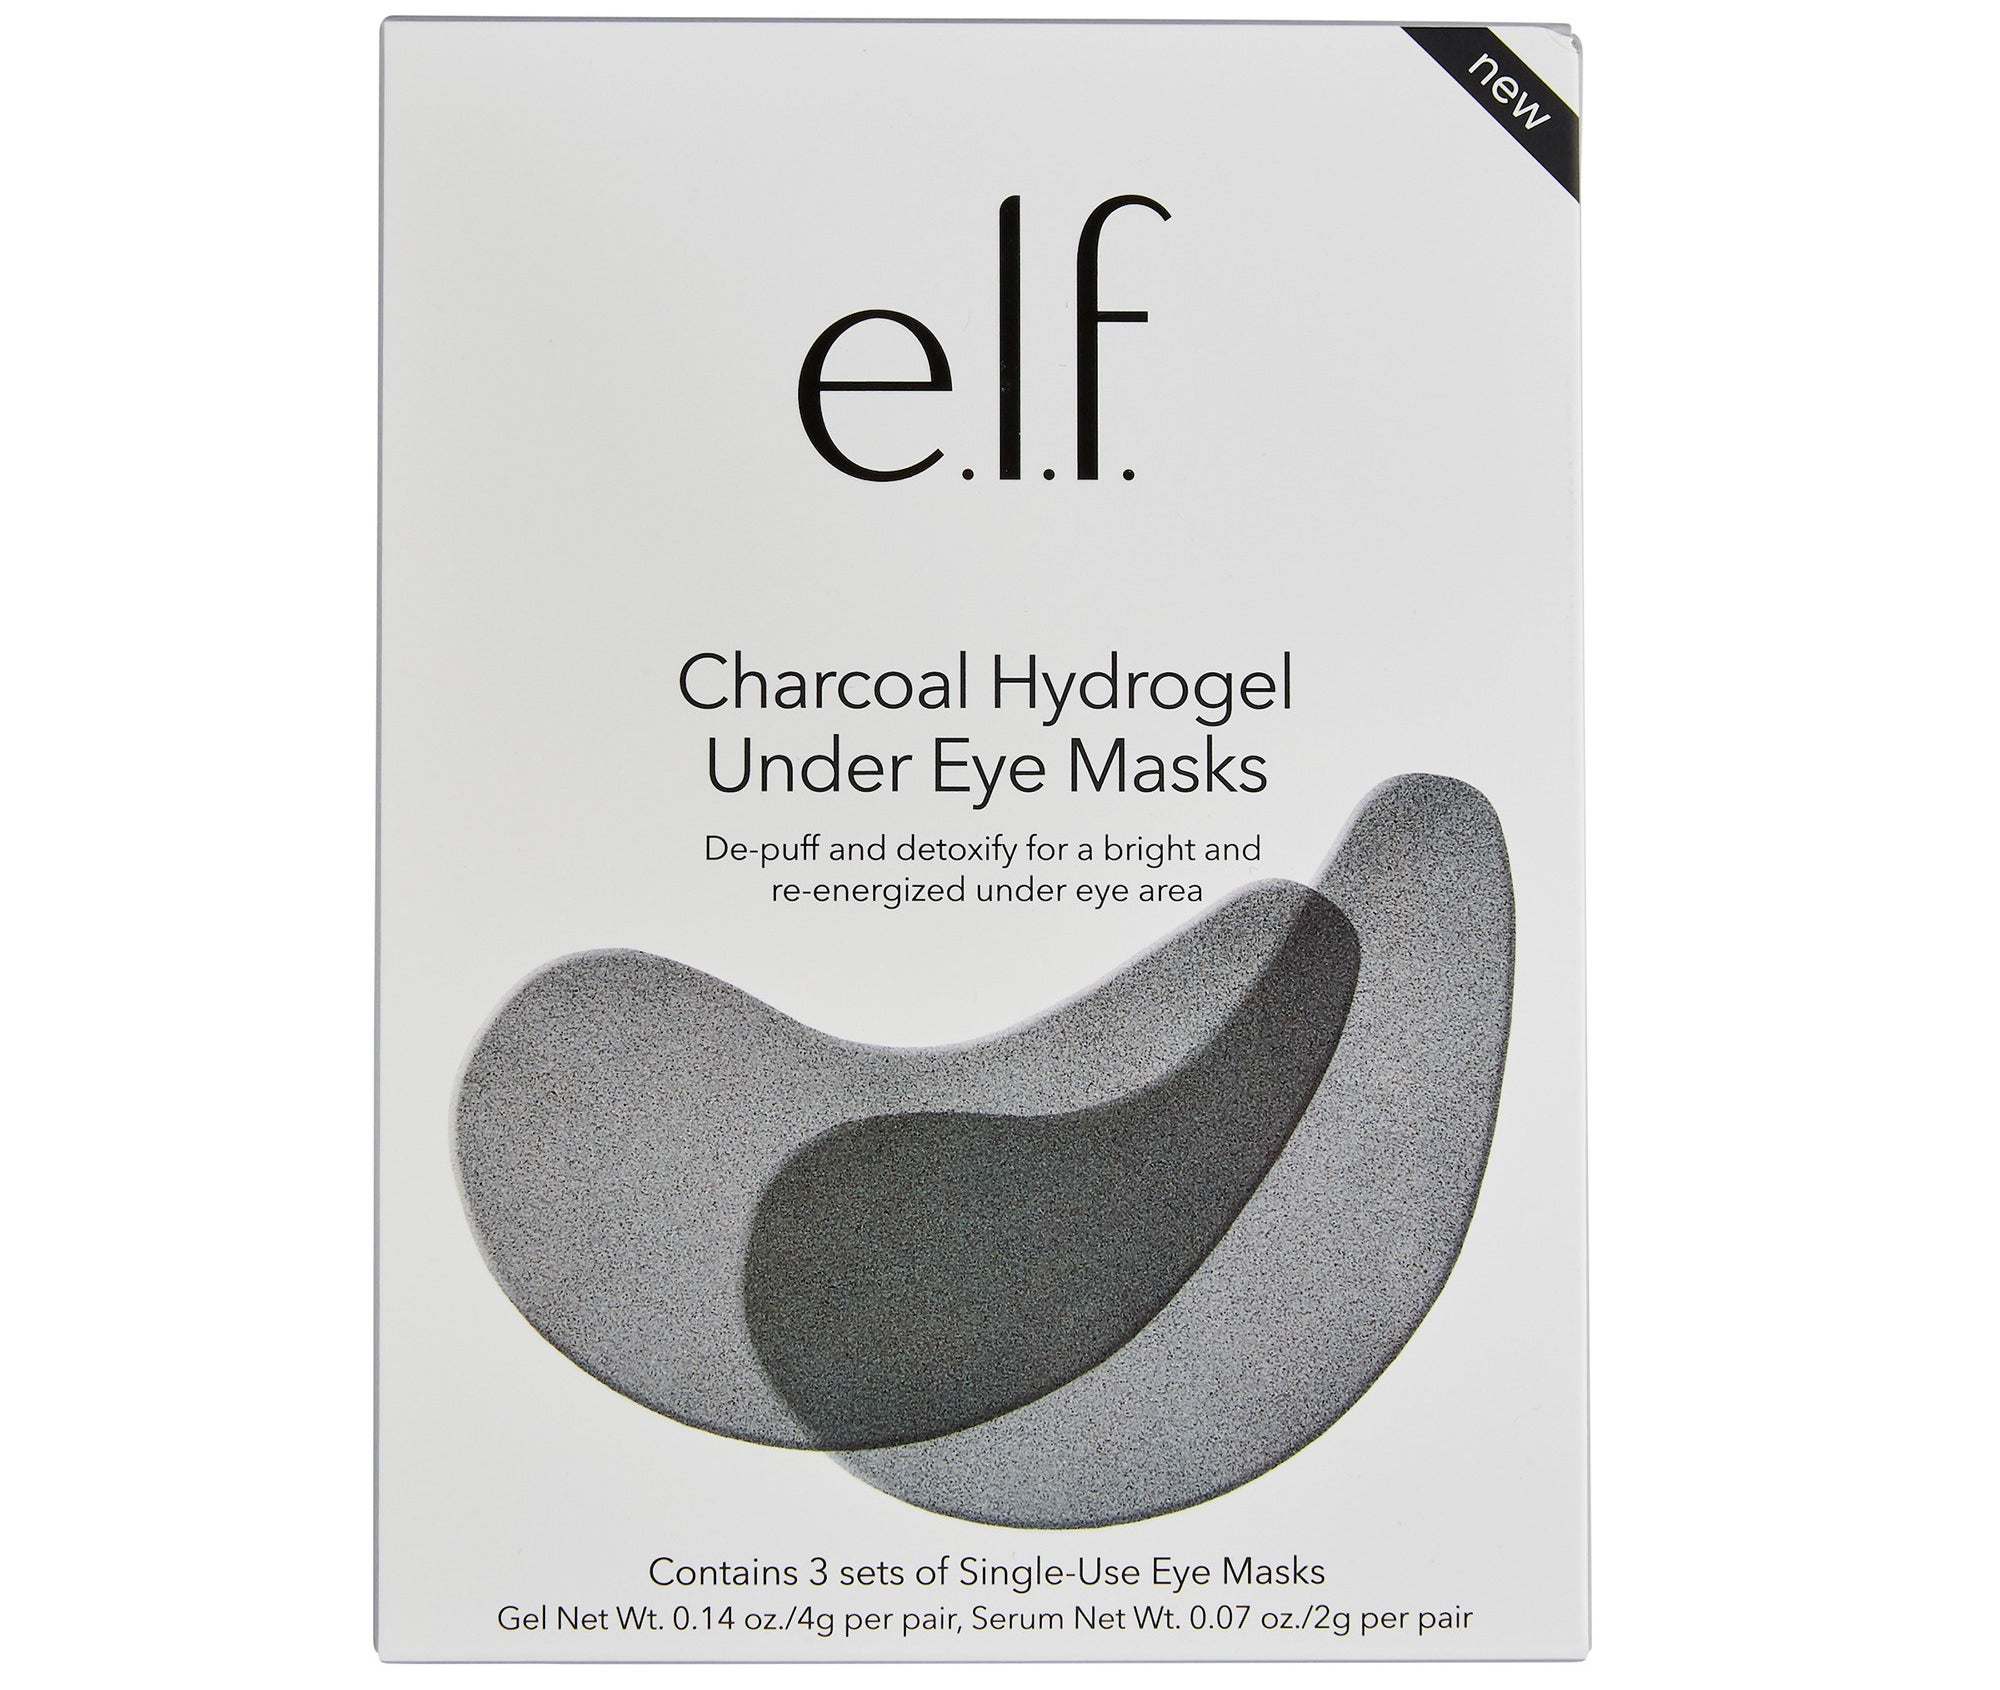 The eye masks